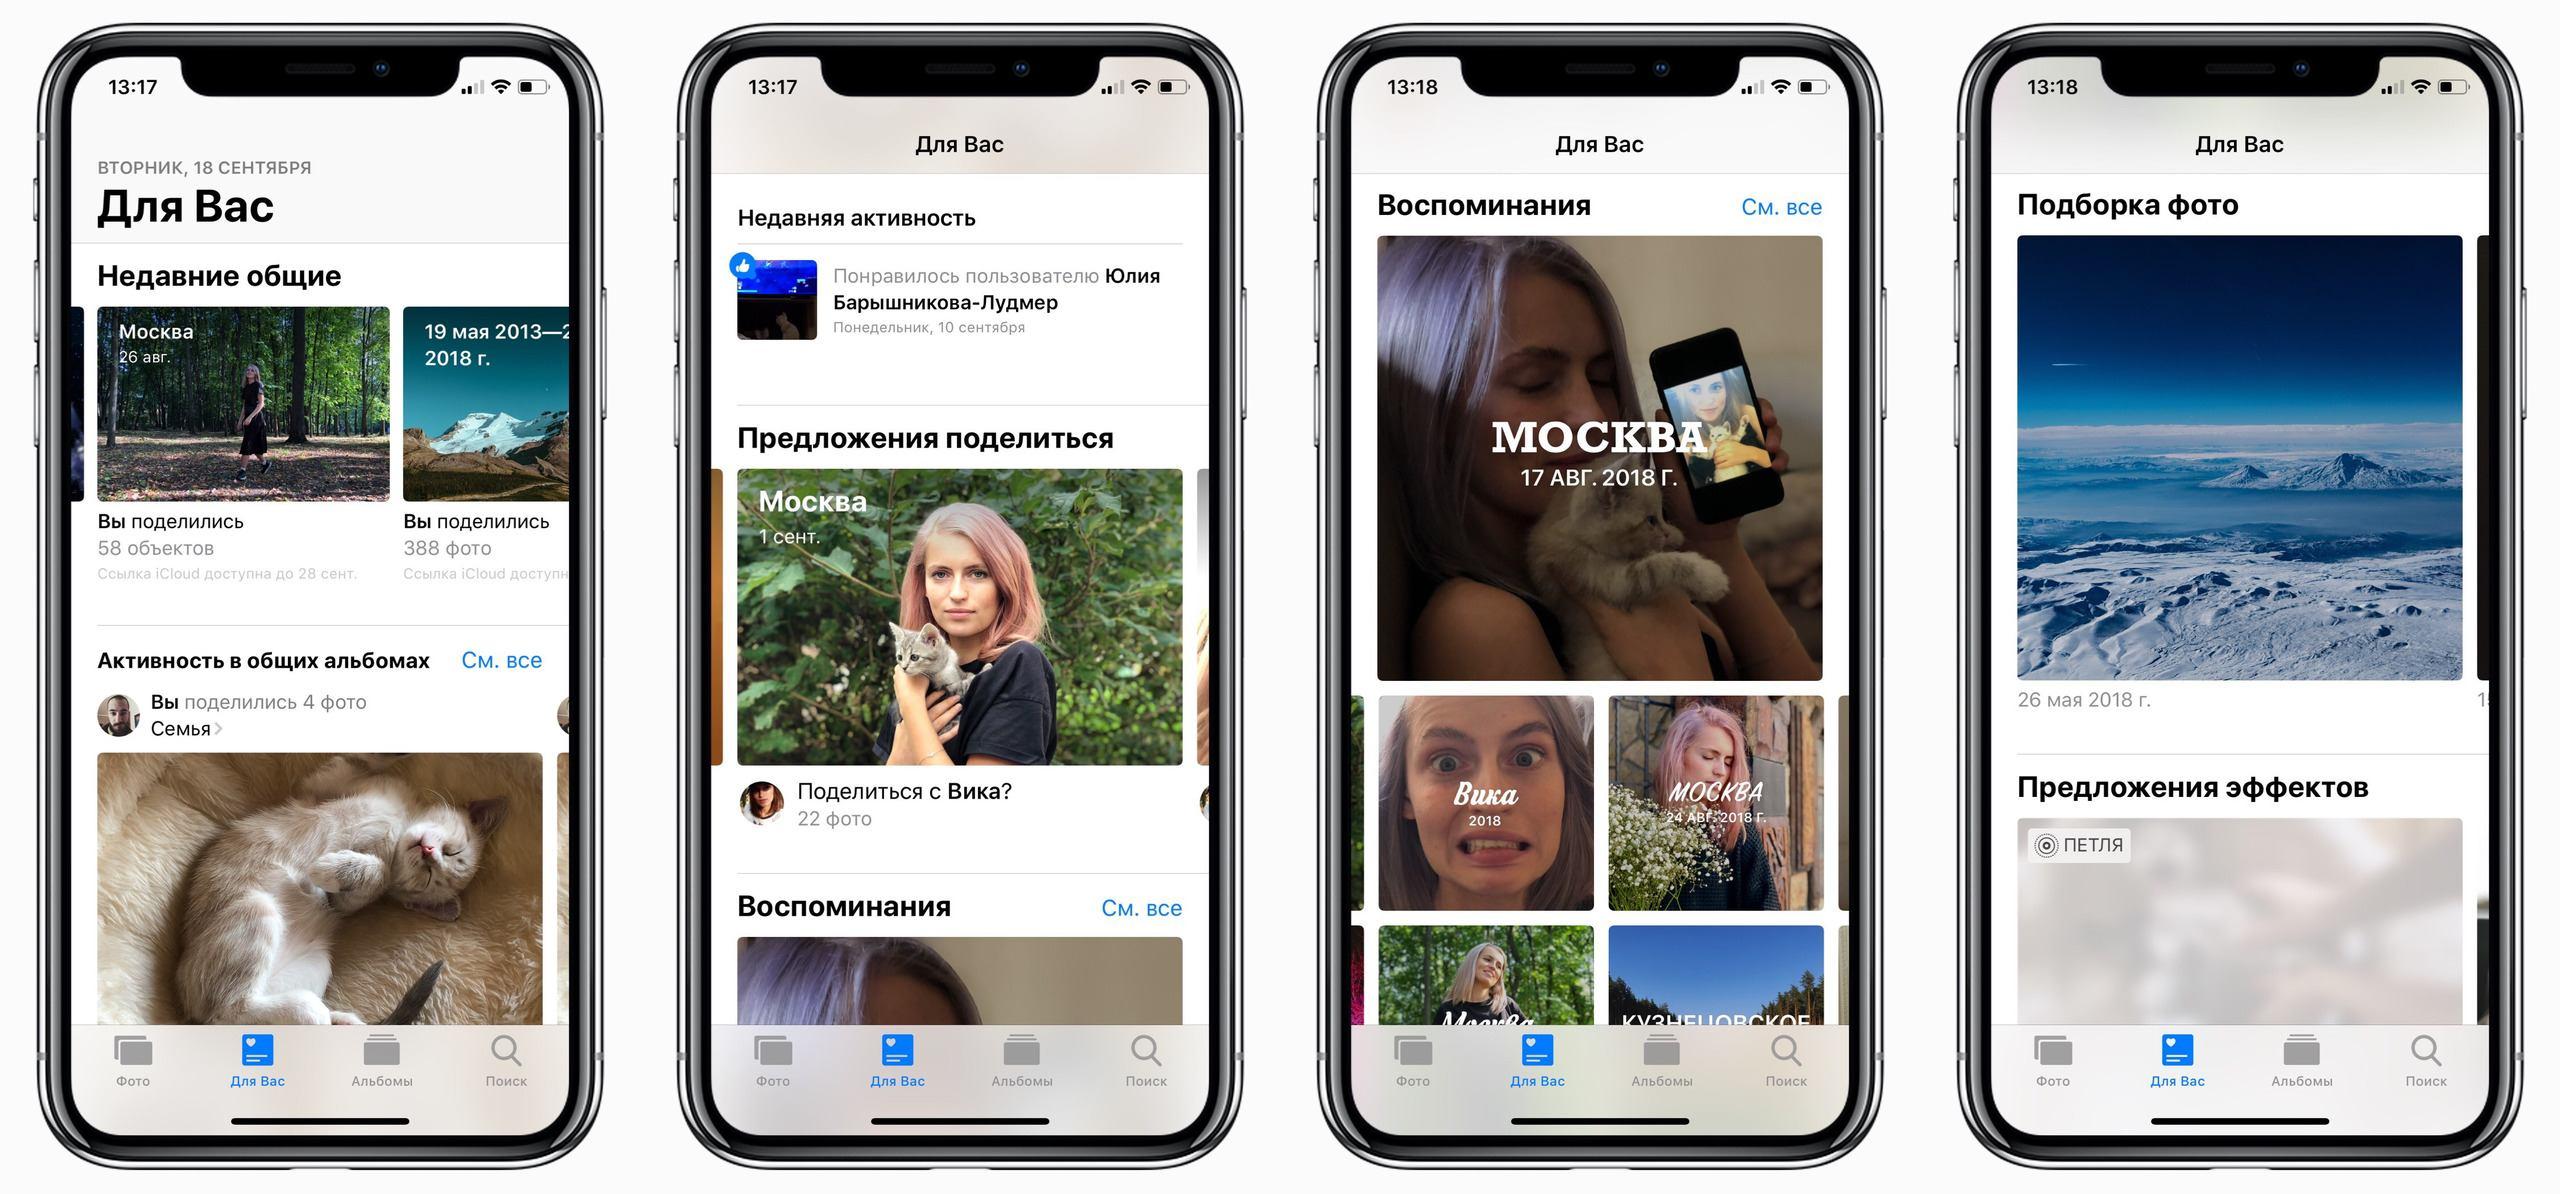 Приложение Фото в iOS 12